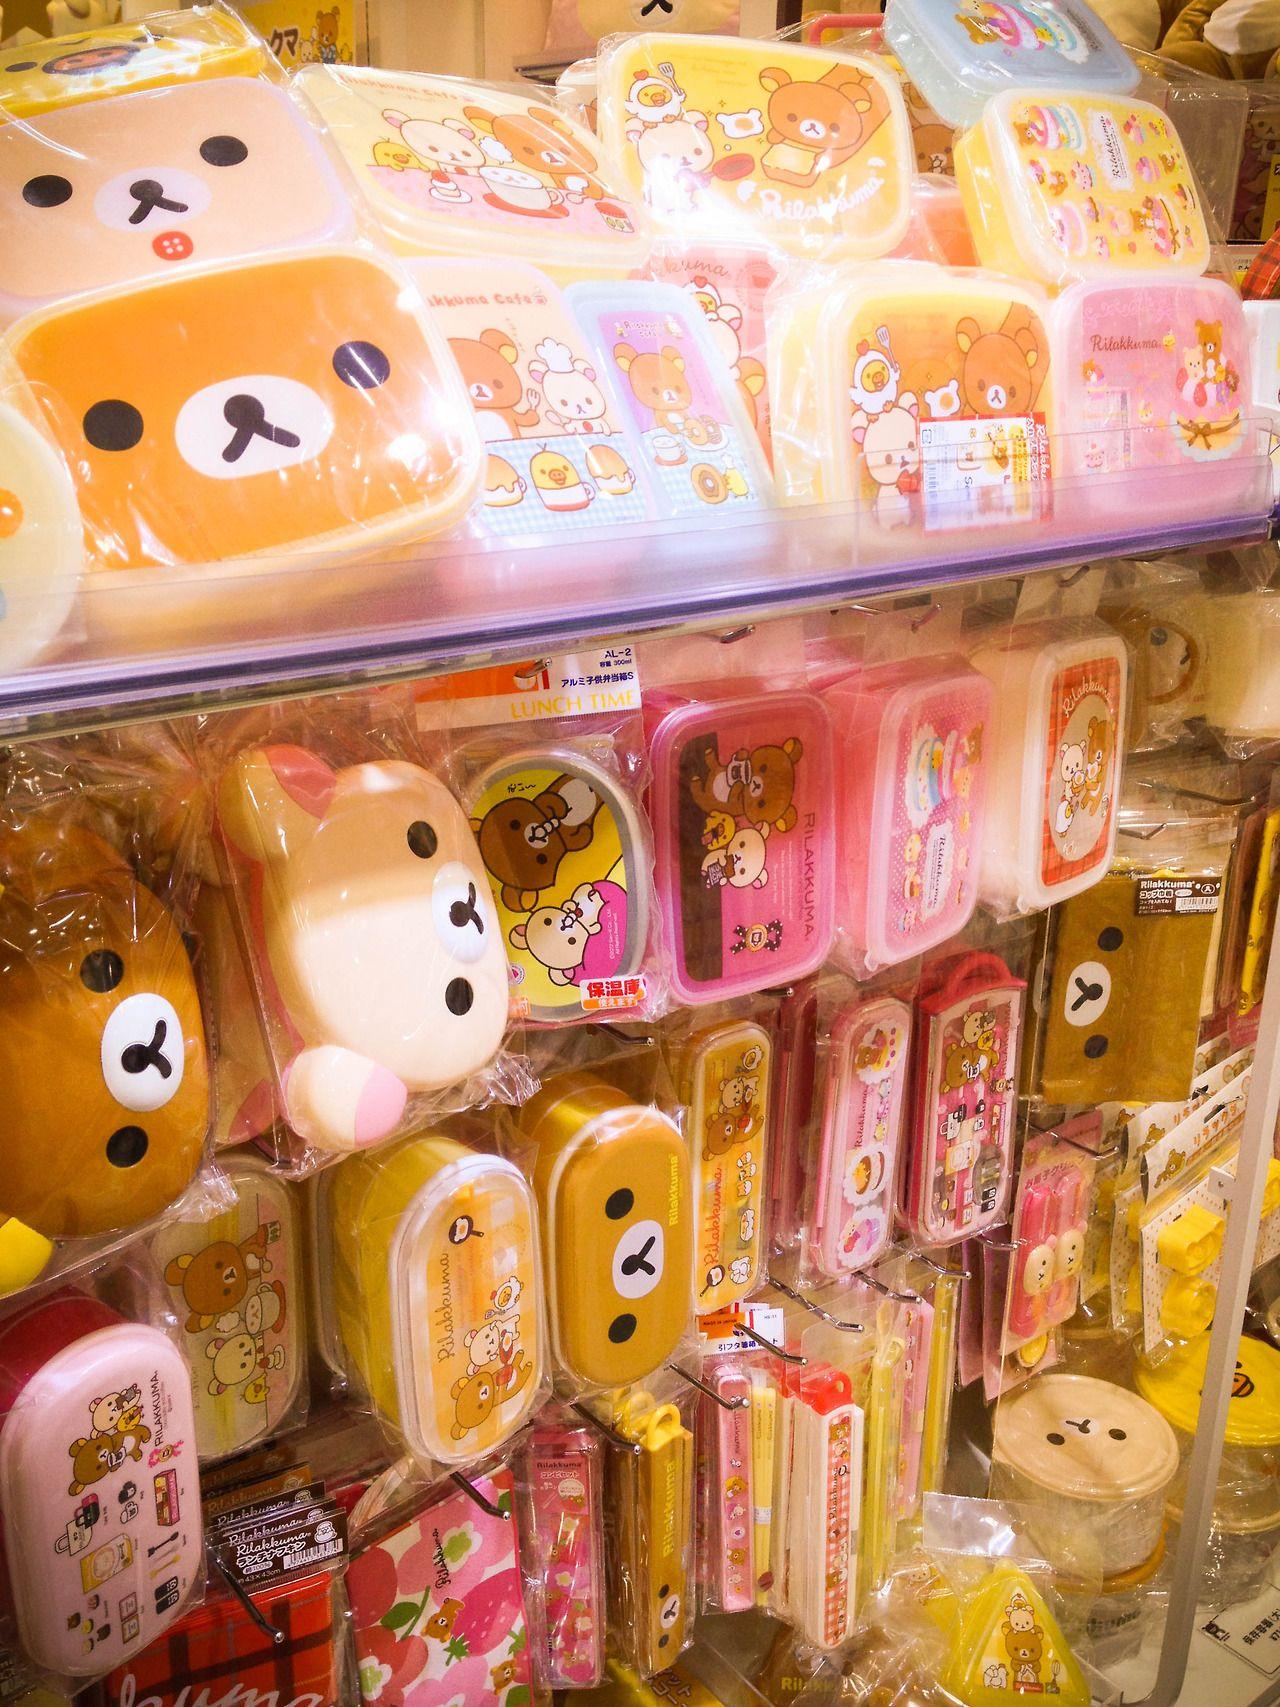 Kawaii Shop Kawaii shop, Kawaii, Kawaii